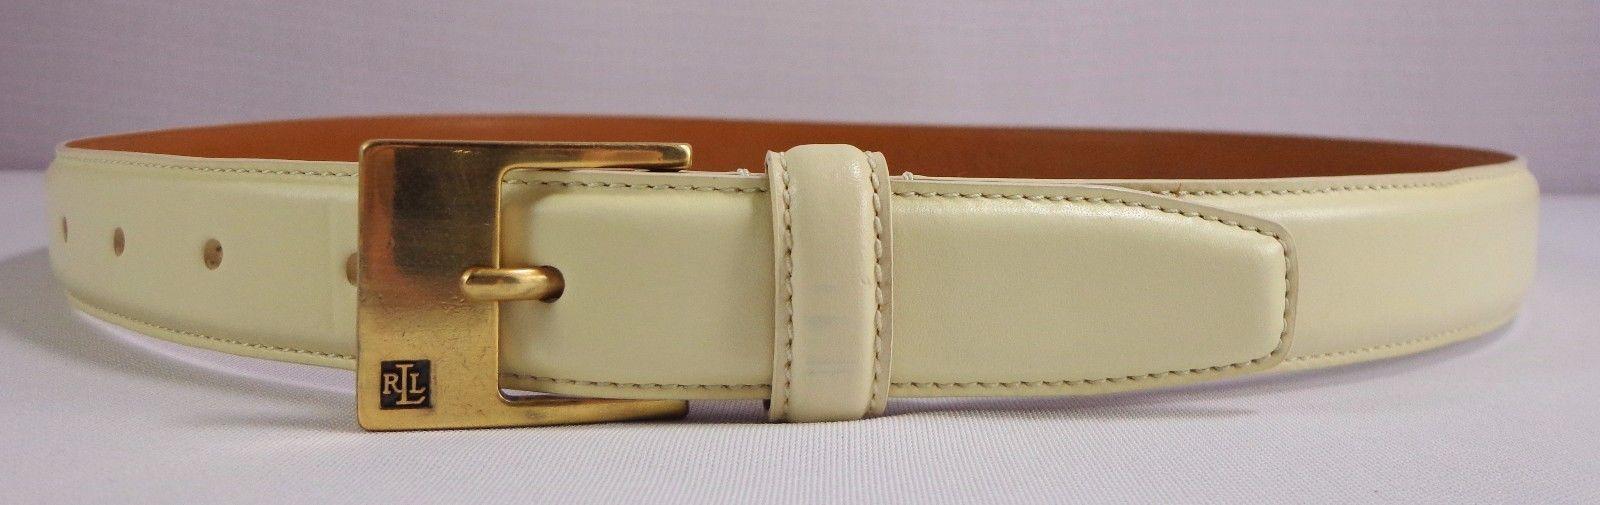 Ralph Lauren Womens Italian Leather Belt Size M Light Cream